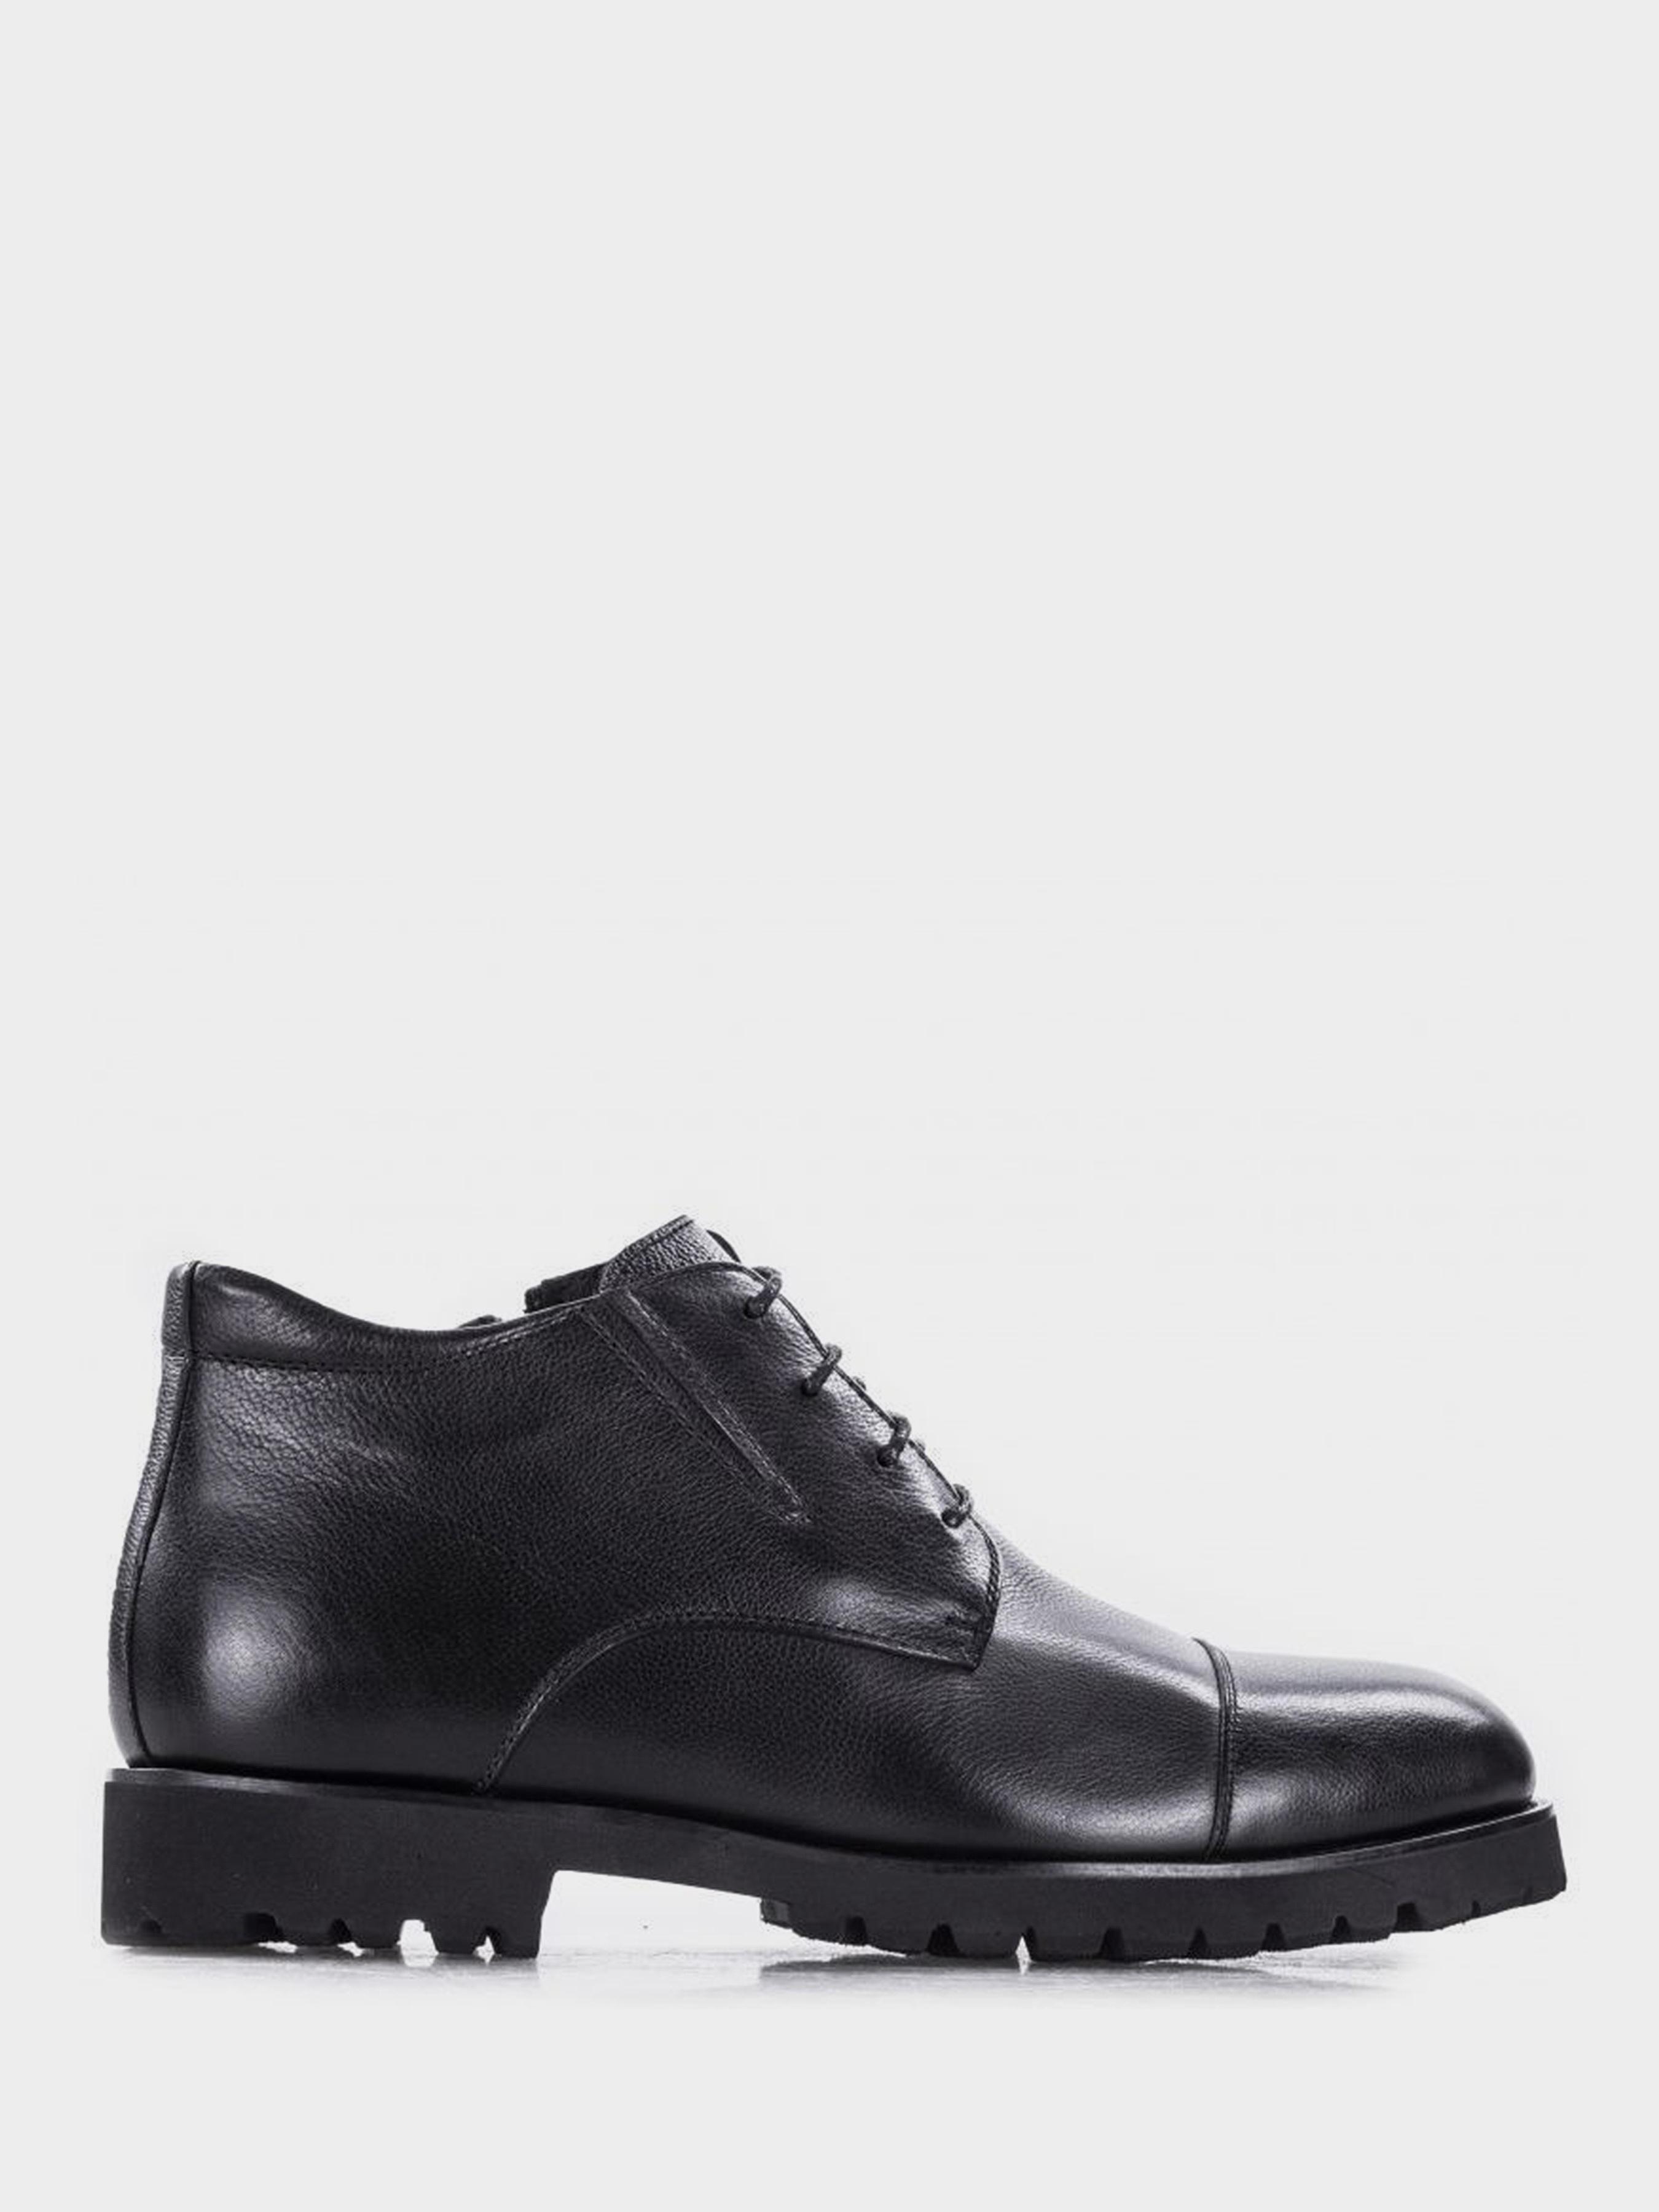 Ботинки для мужчин Braska BR1557 брендовые, 2017